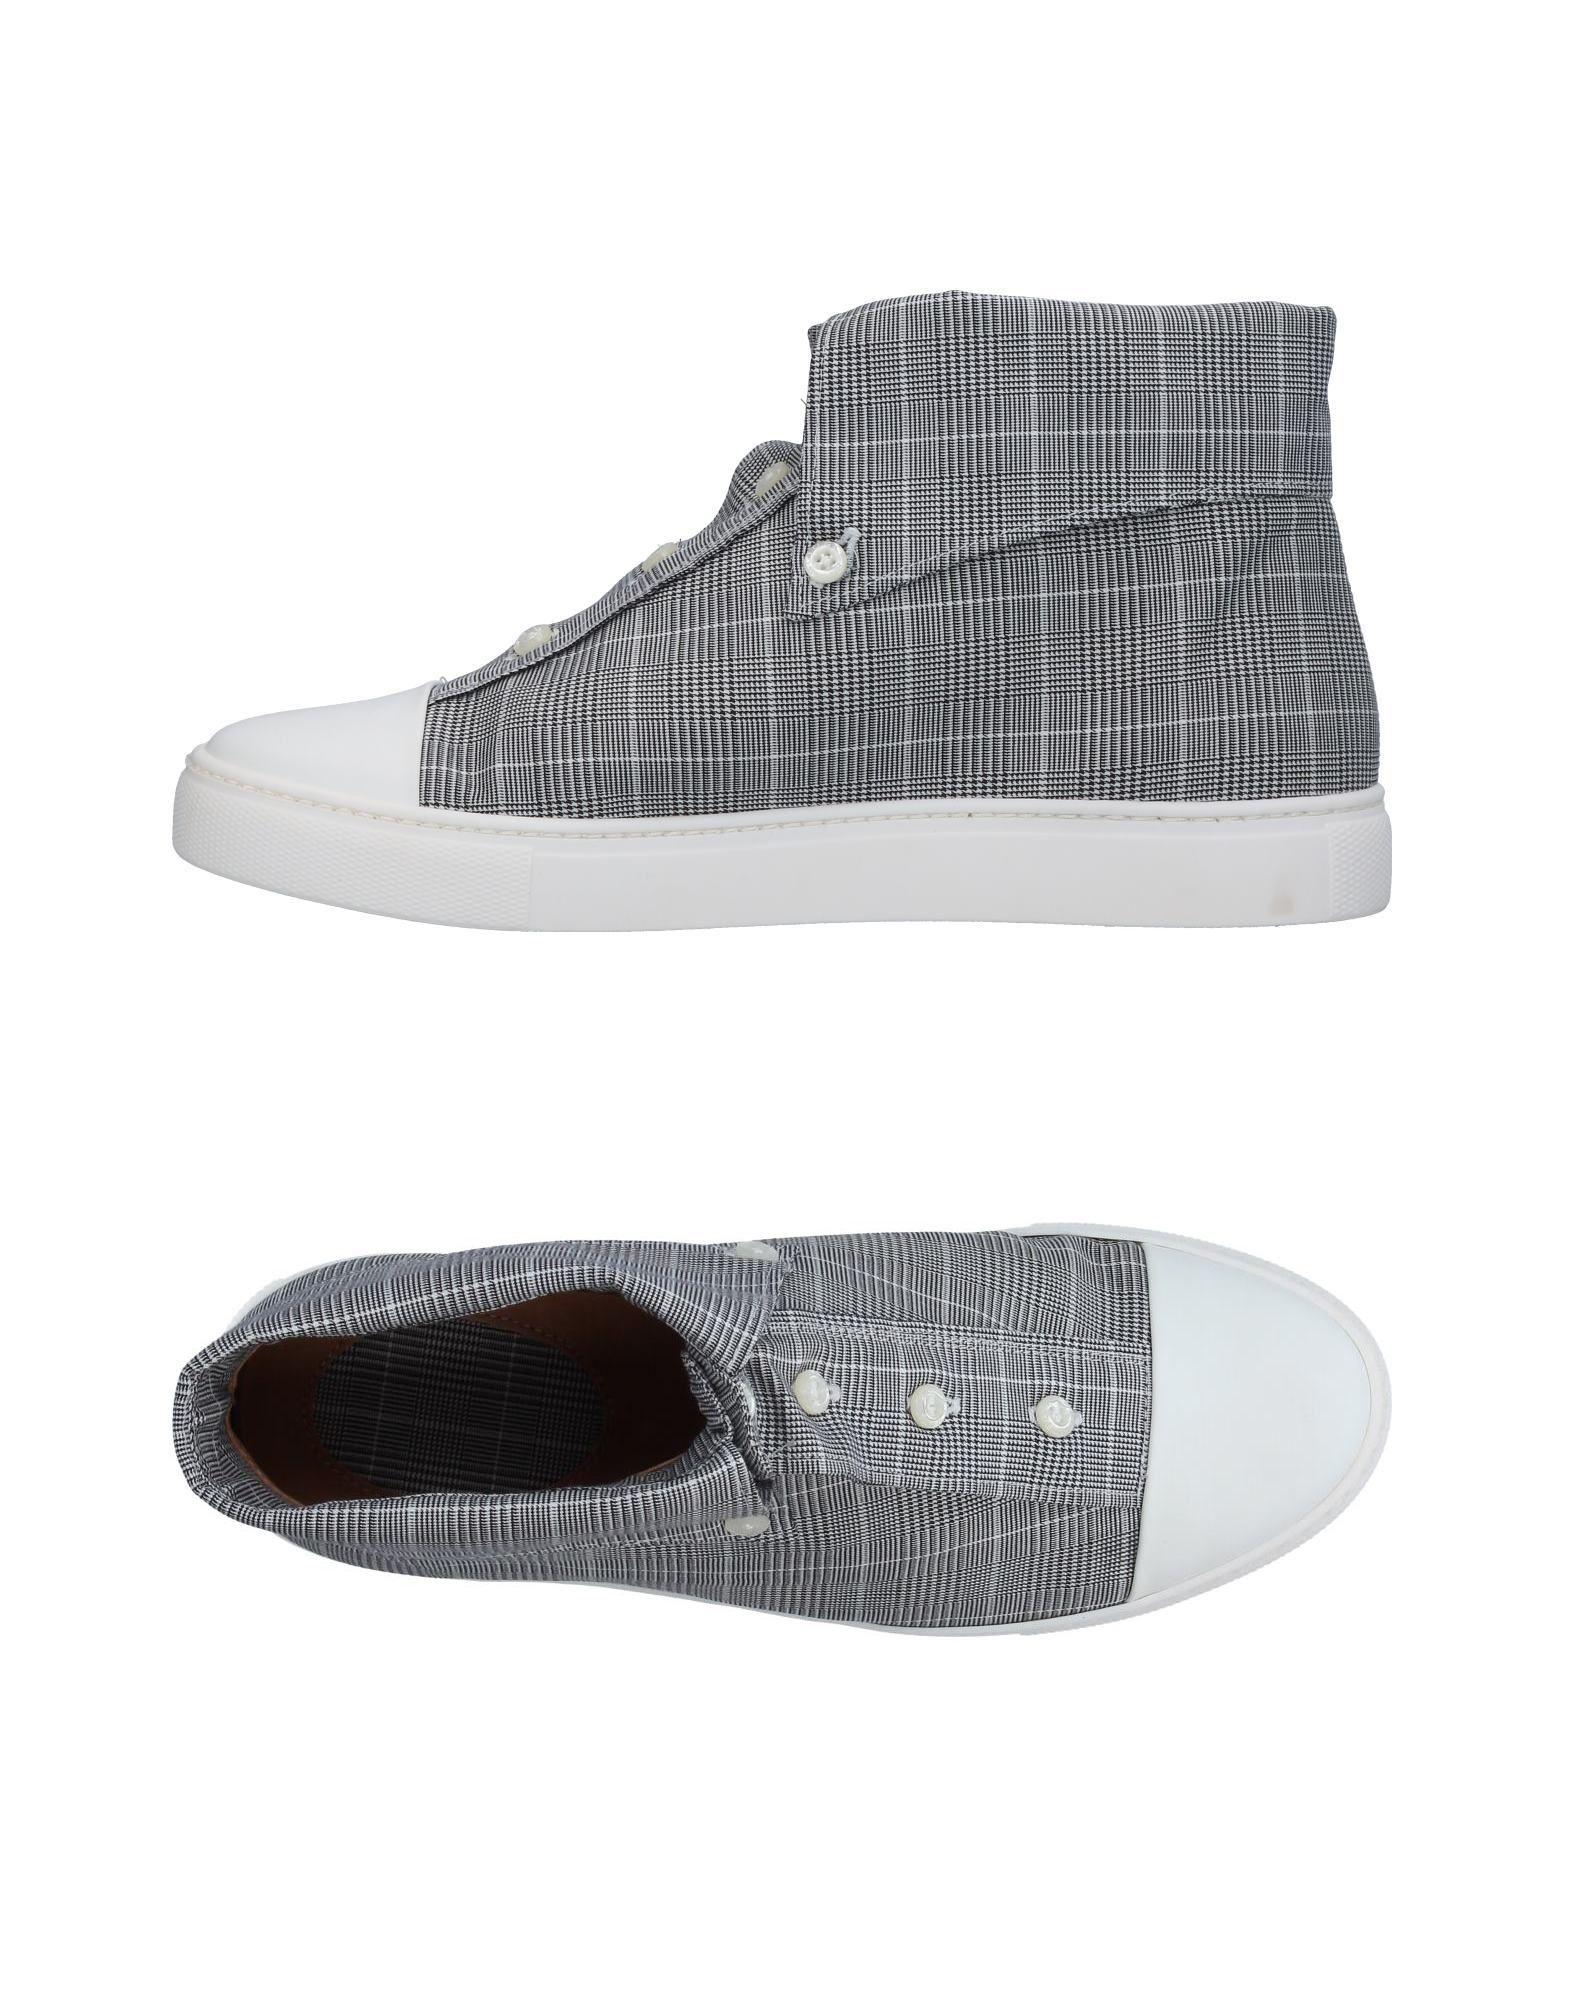 Sneakers Sciuscert Uomo - Acquista online su